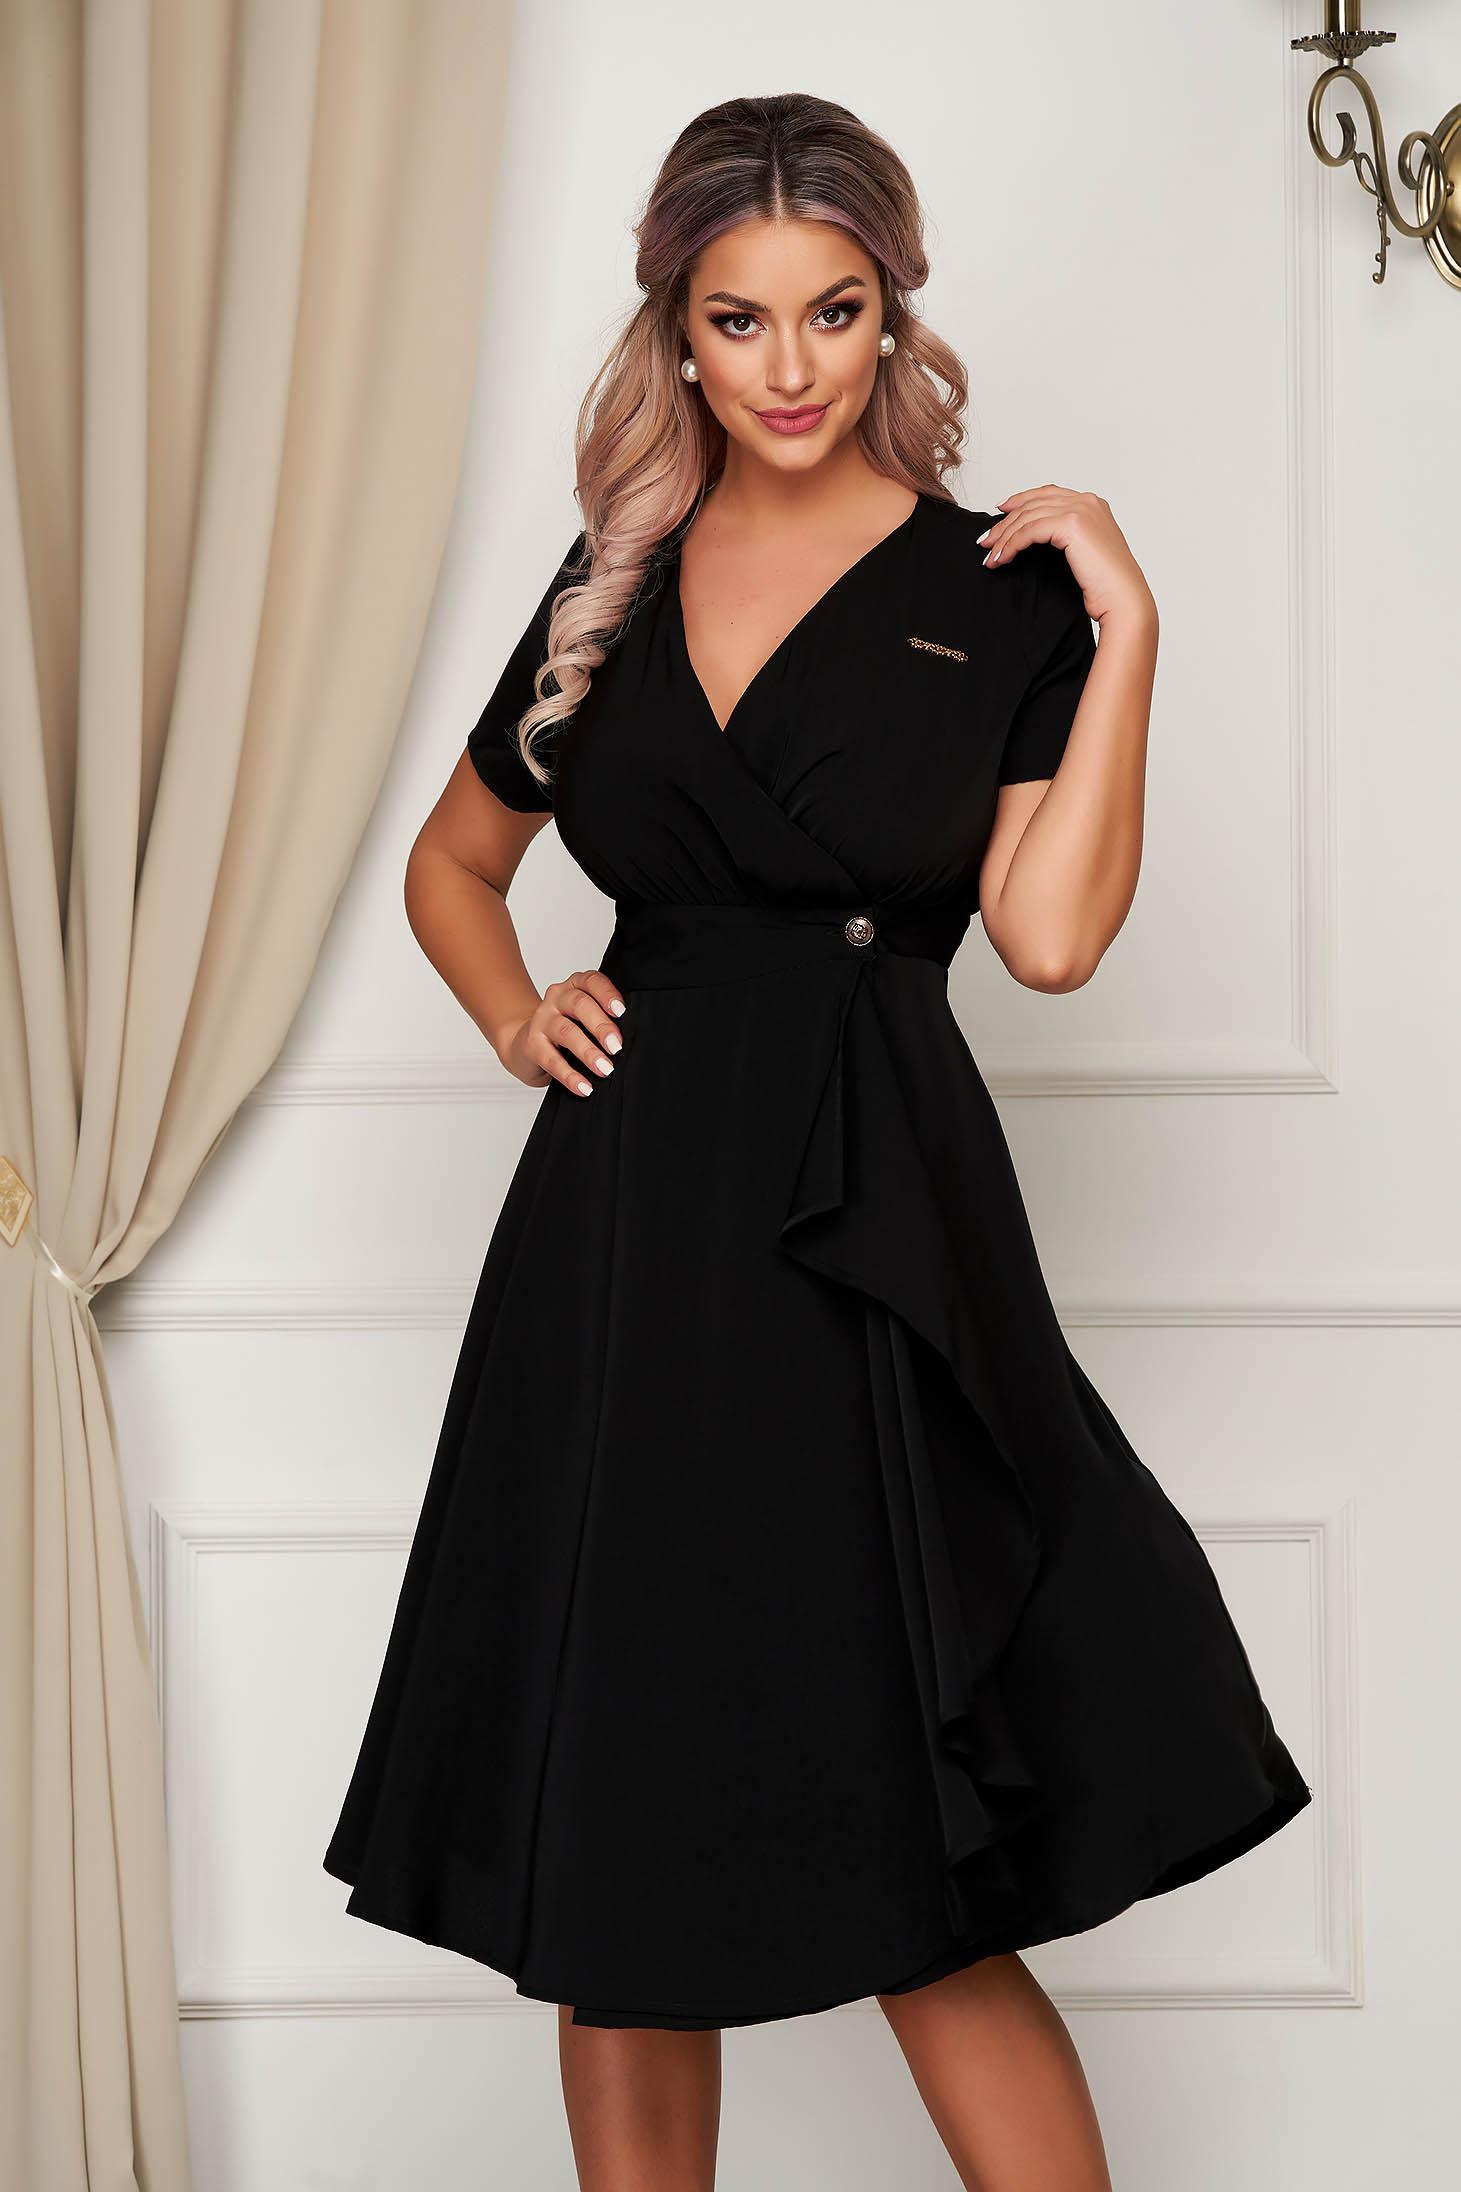 Black dress midi daily thin fabric cloche with v-neckline